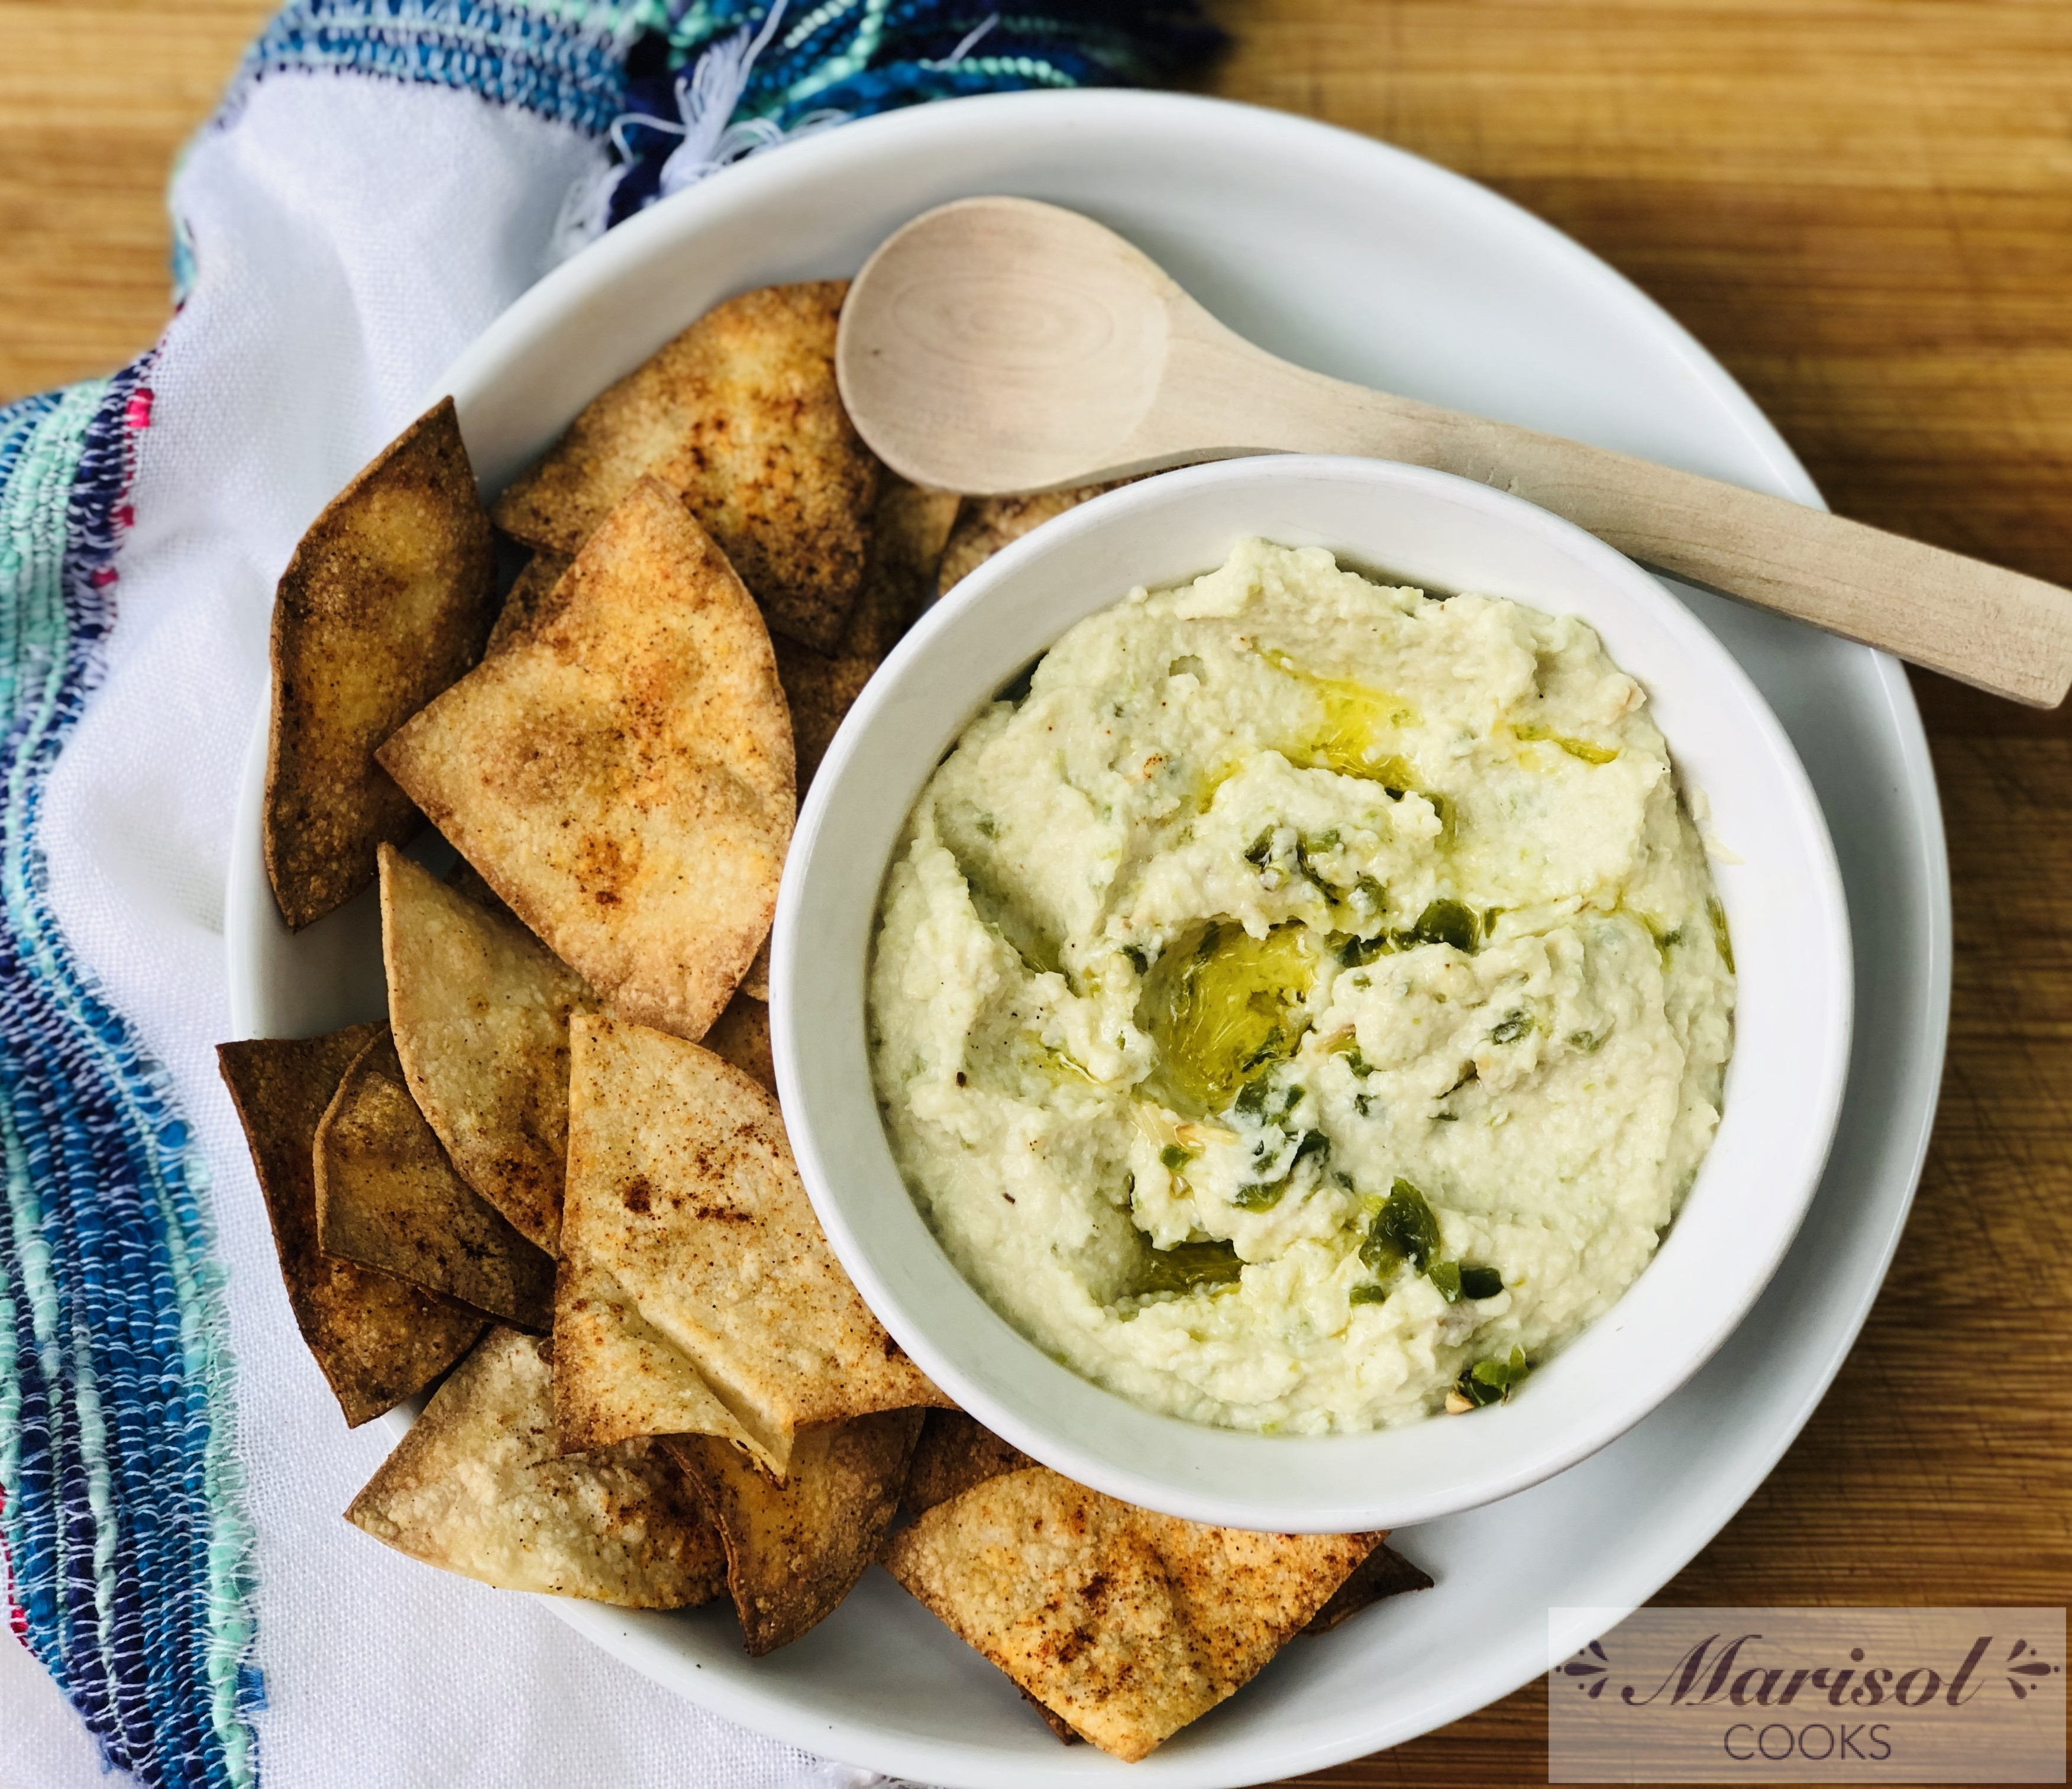 Roasted Garlic and Jalapeño Hummus (Cauliflower)